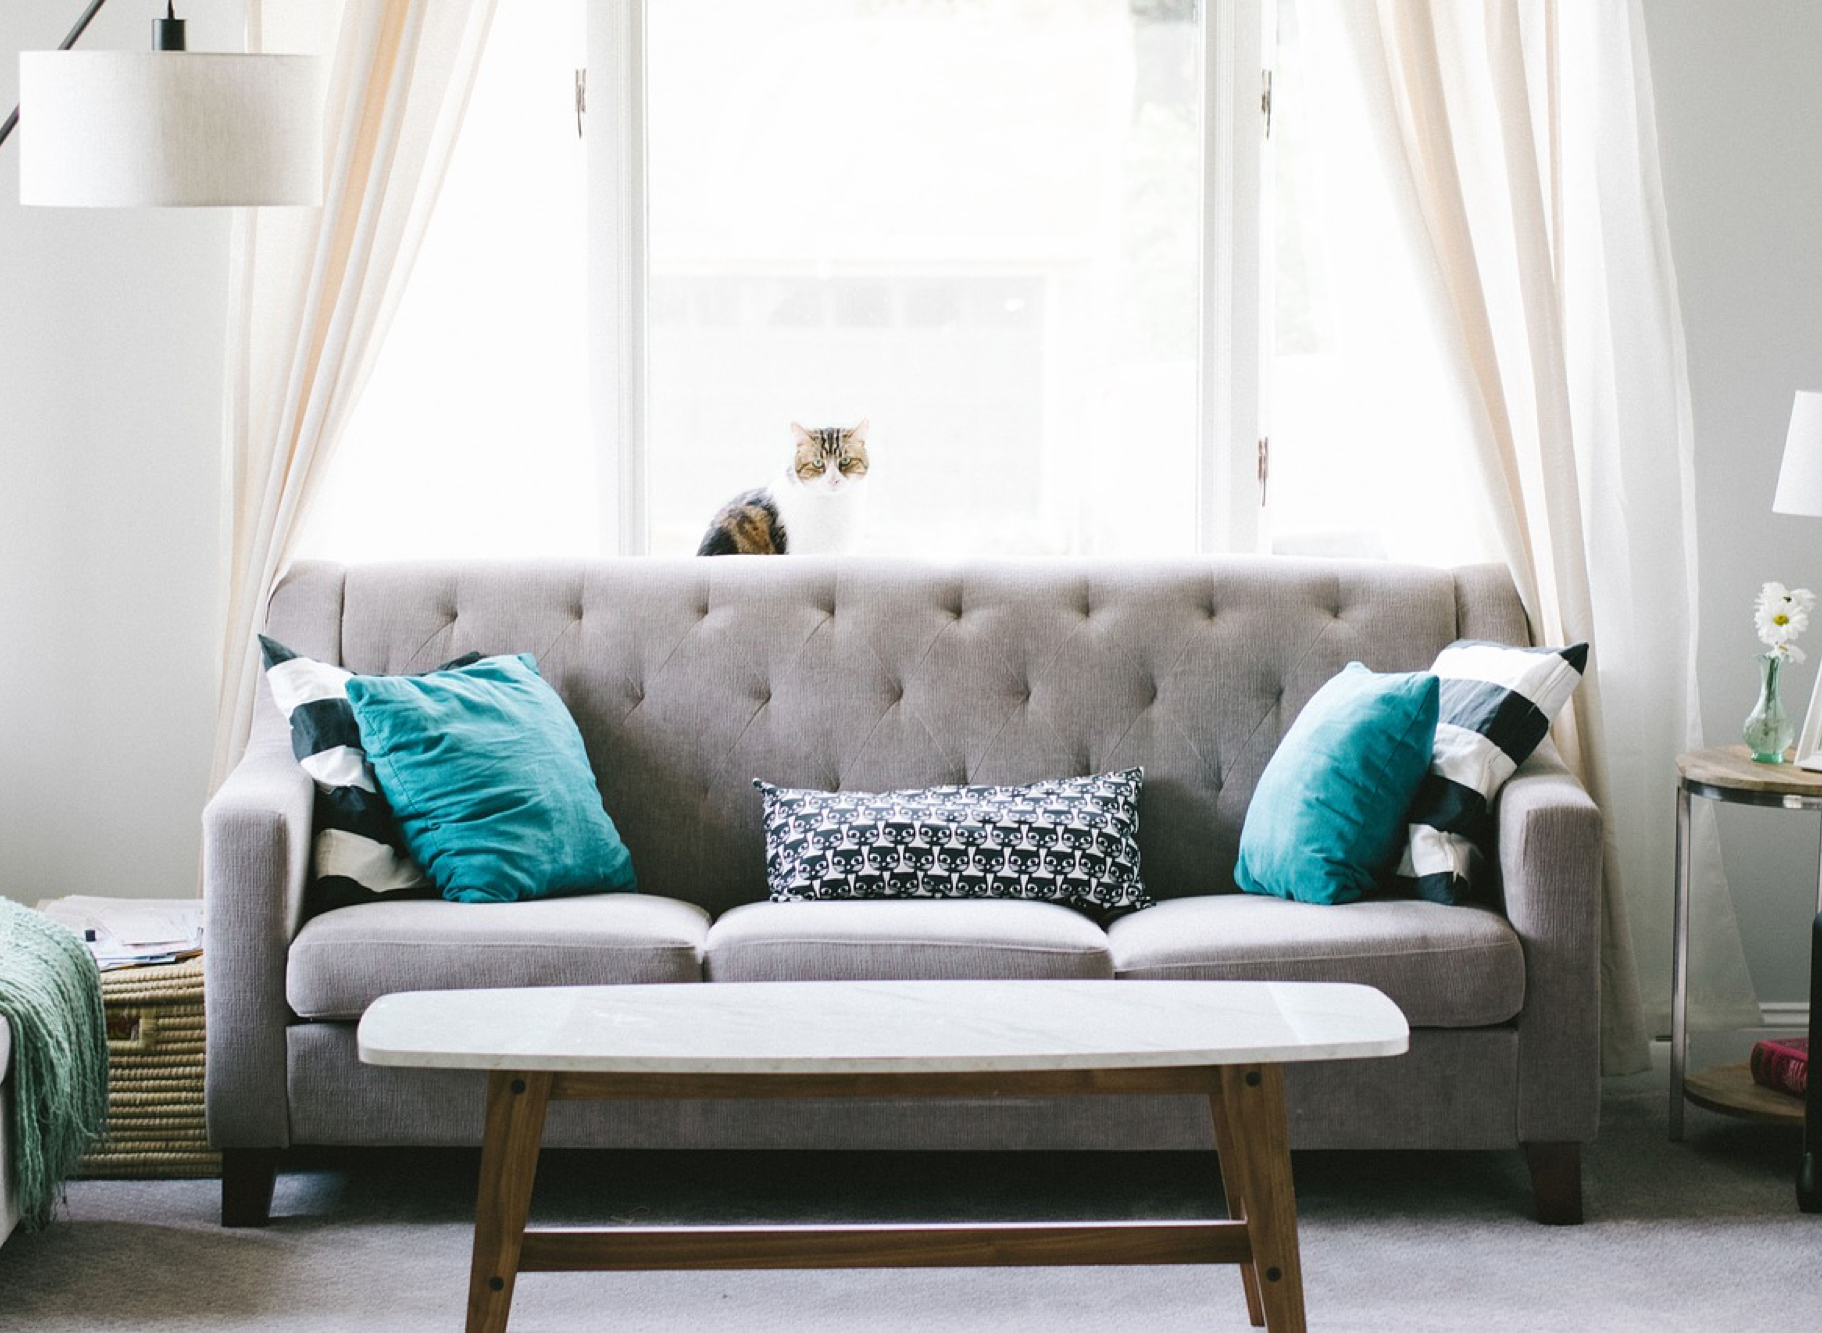 Pet Problems? Rearrange Your Furniture - Coryelle Kramer ...